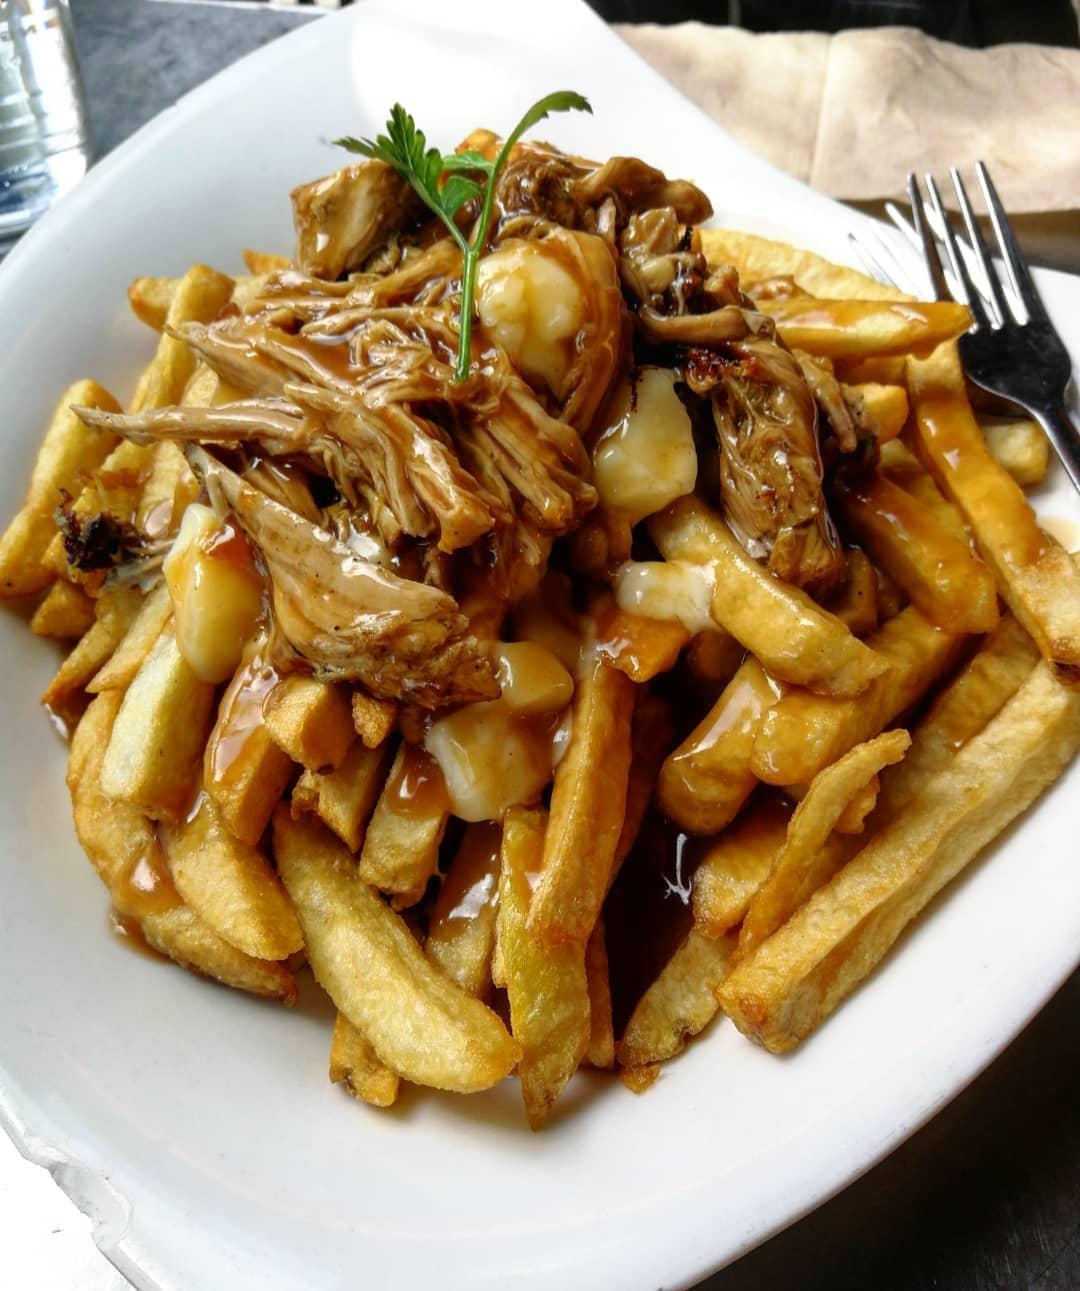 Noms Mag commercial drive neighbourhood guidebook belgian fries